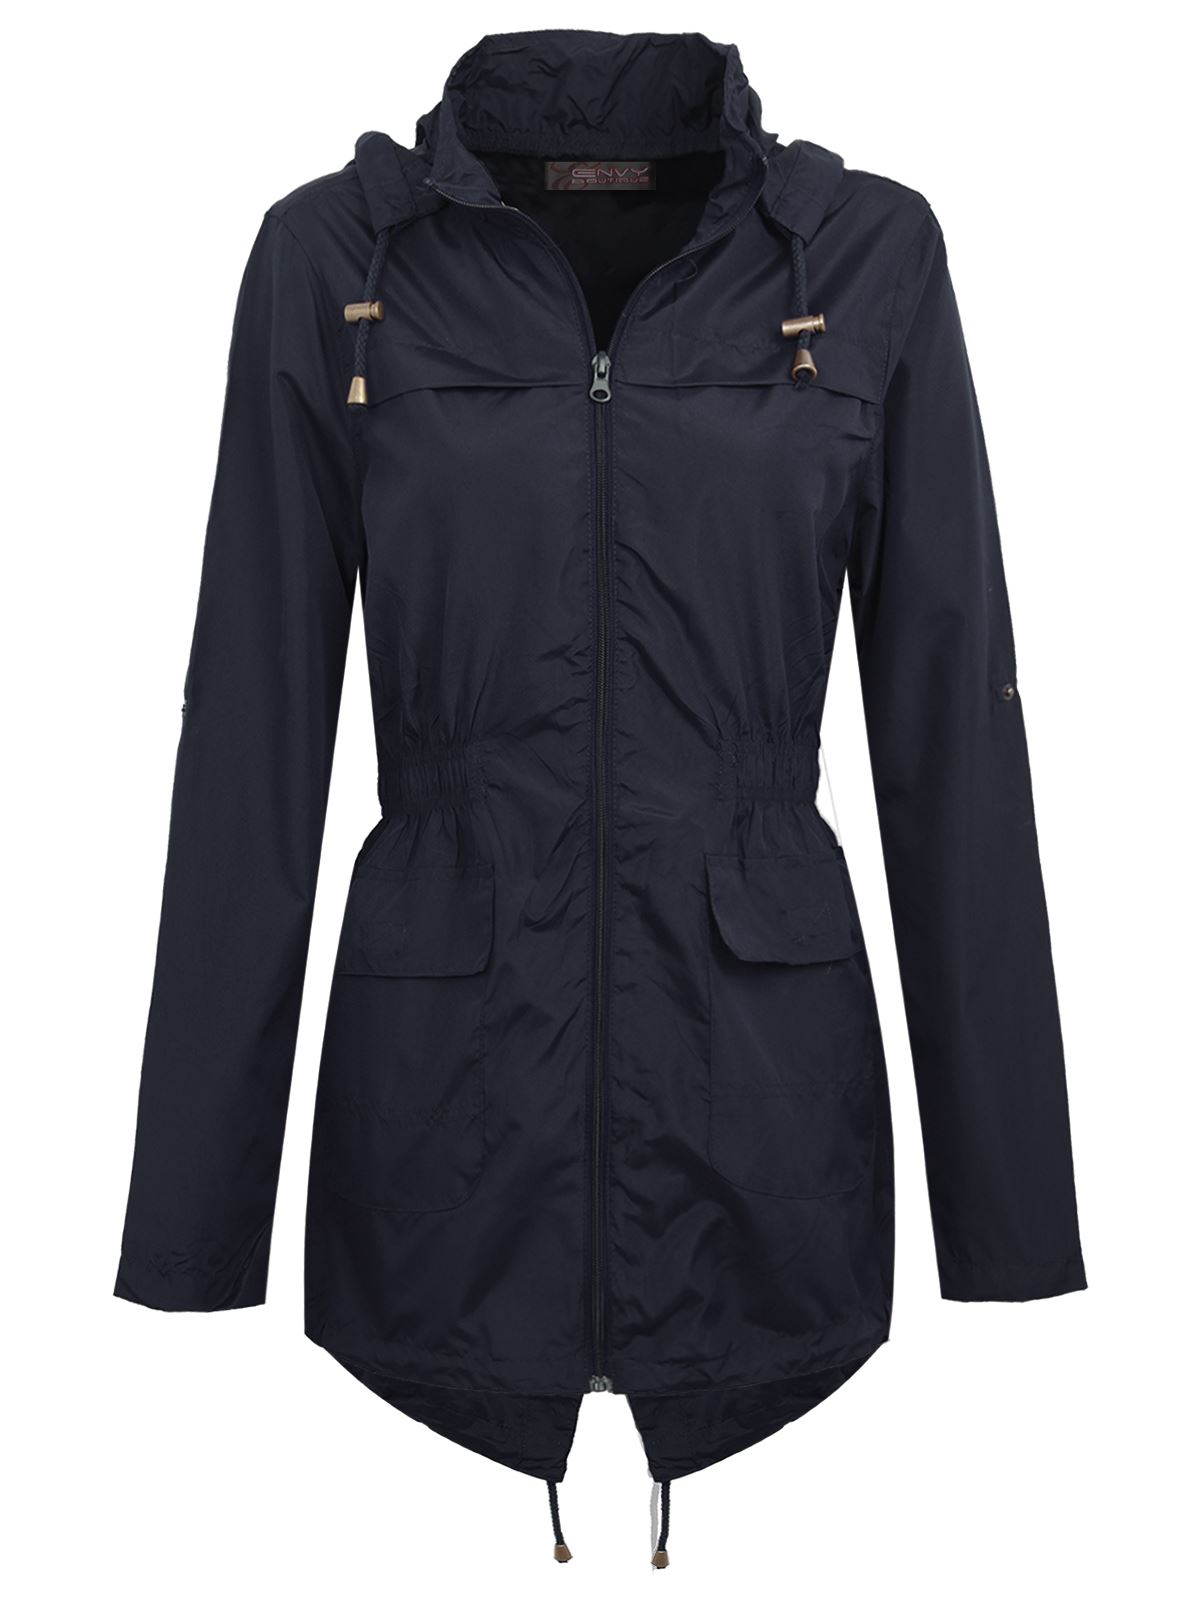 hooded raincoats for women - photo #11